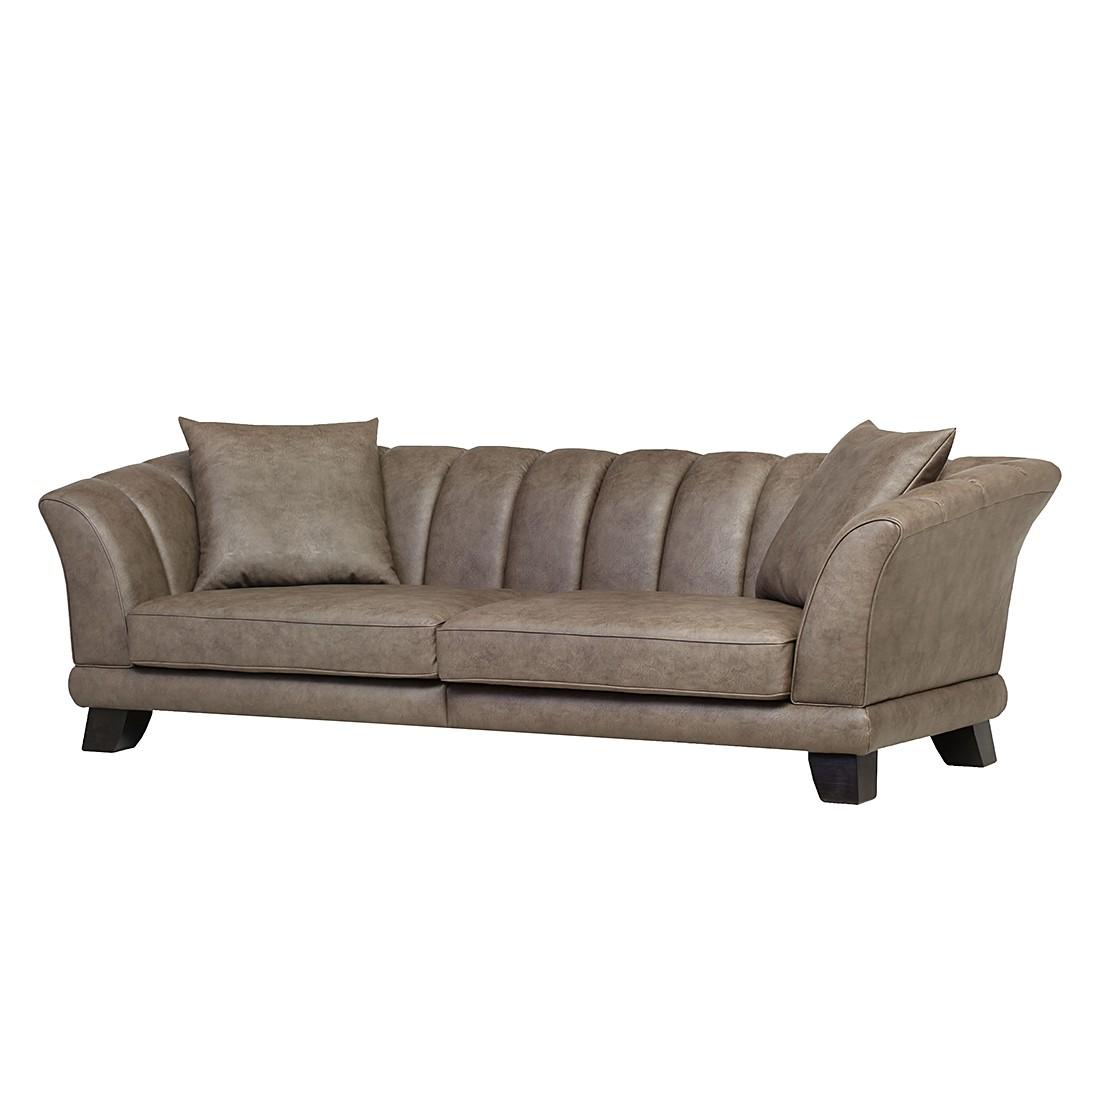 Bigsofa Mira (4-Sitzer) – Lederoptik Braun, Maison Belfort günstig bestellen